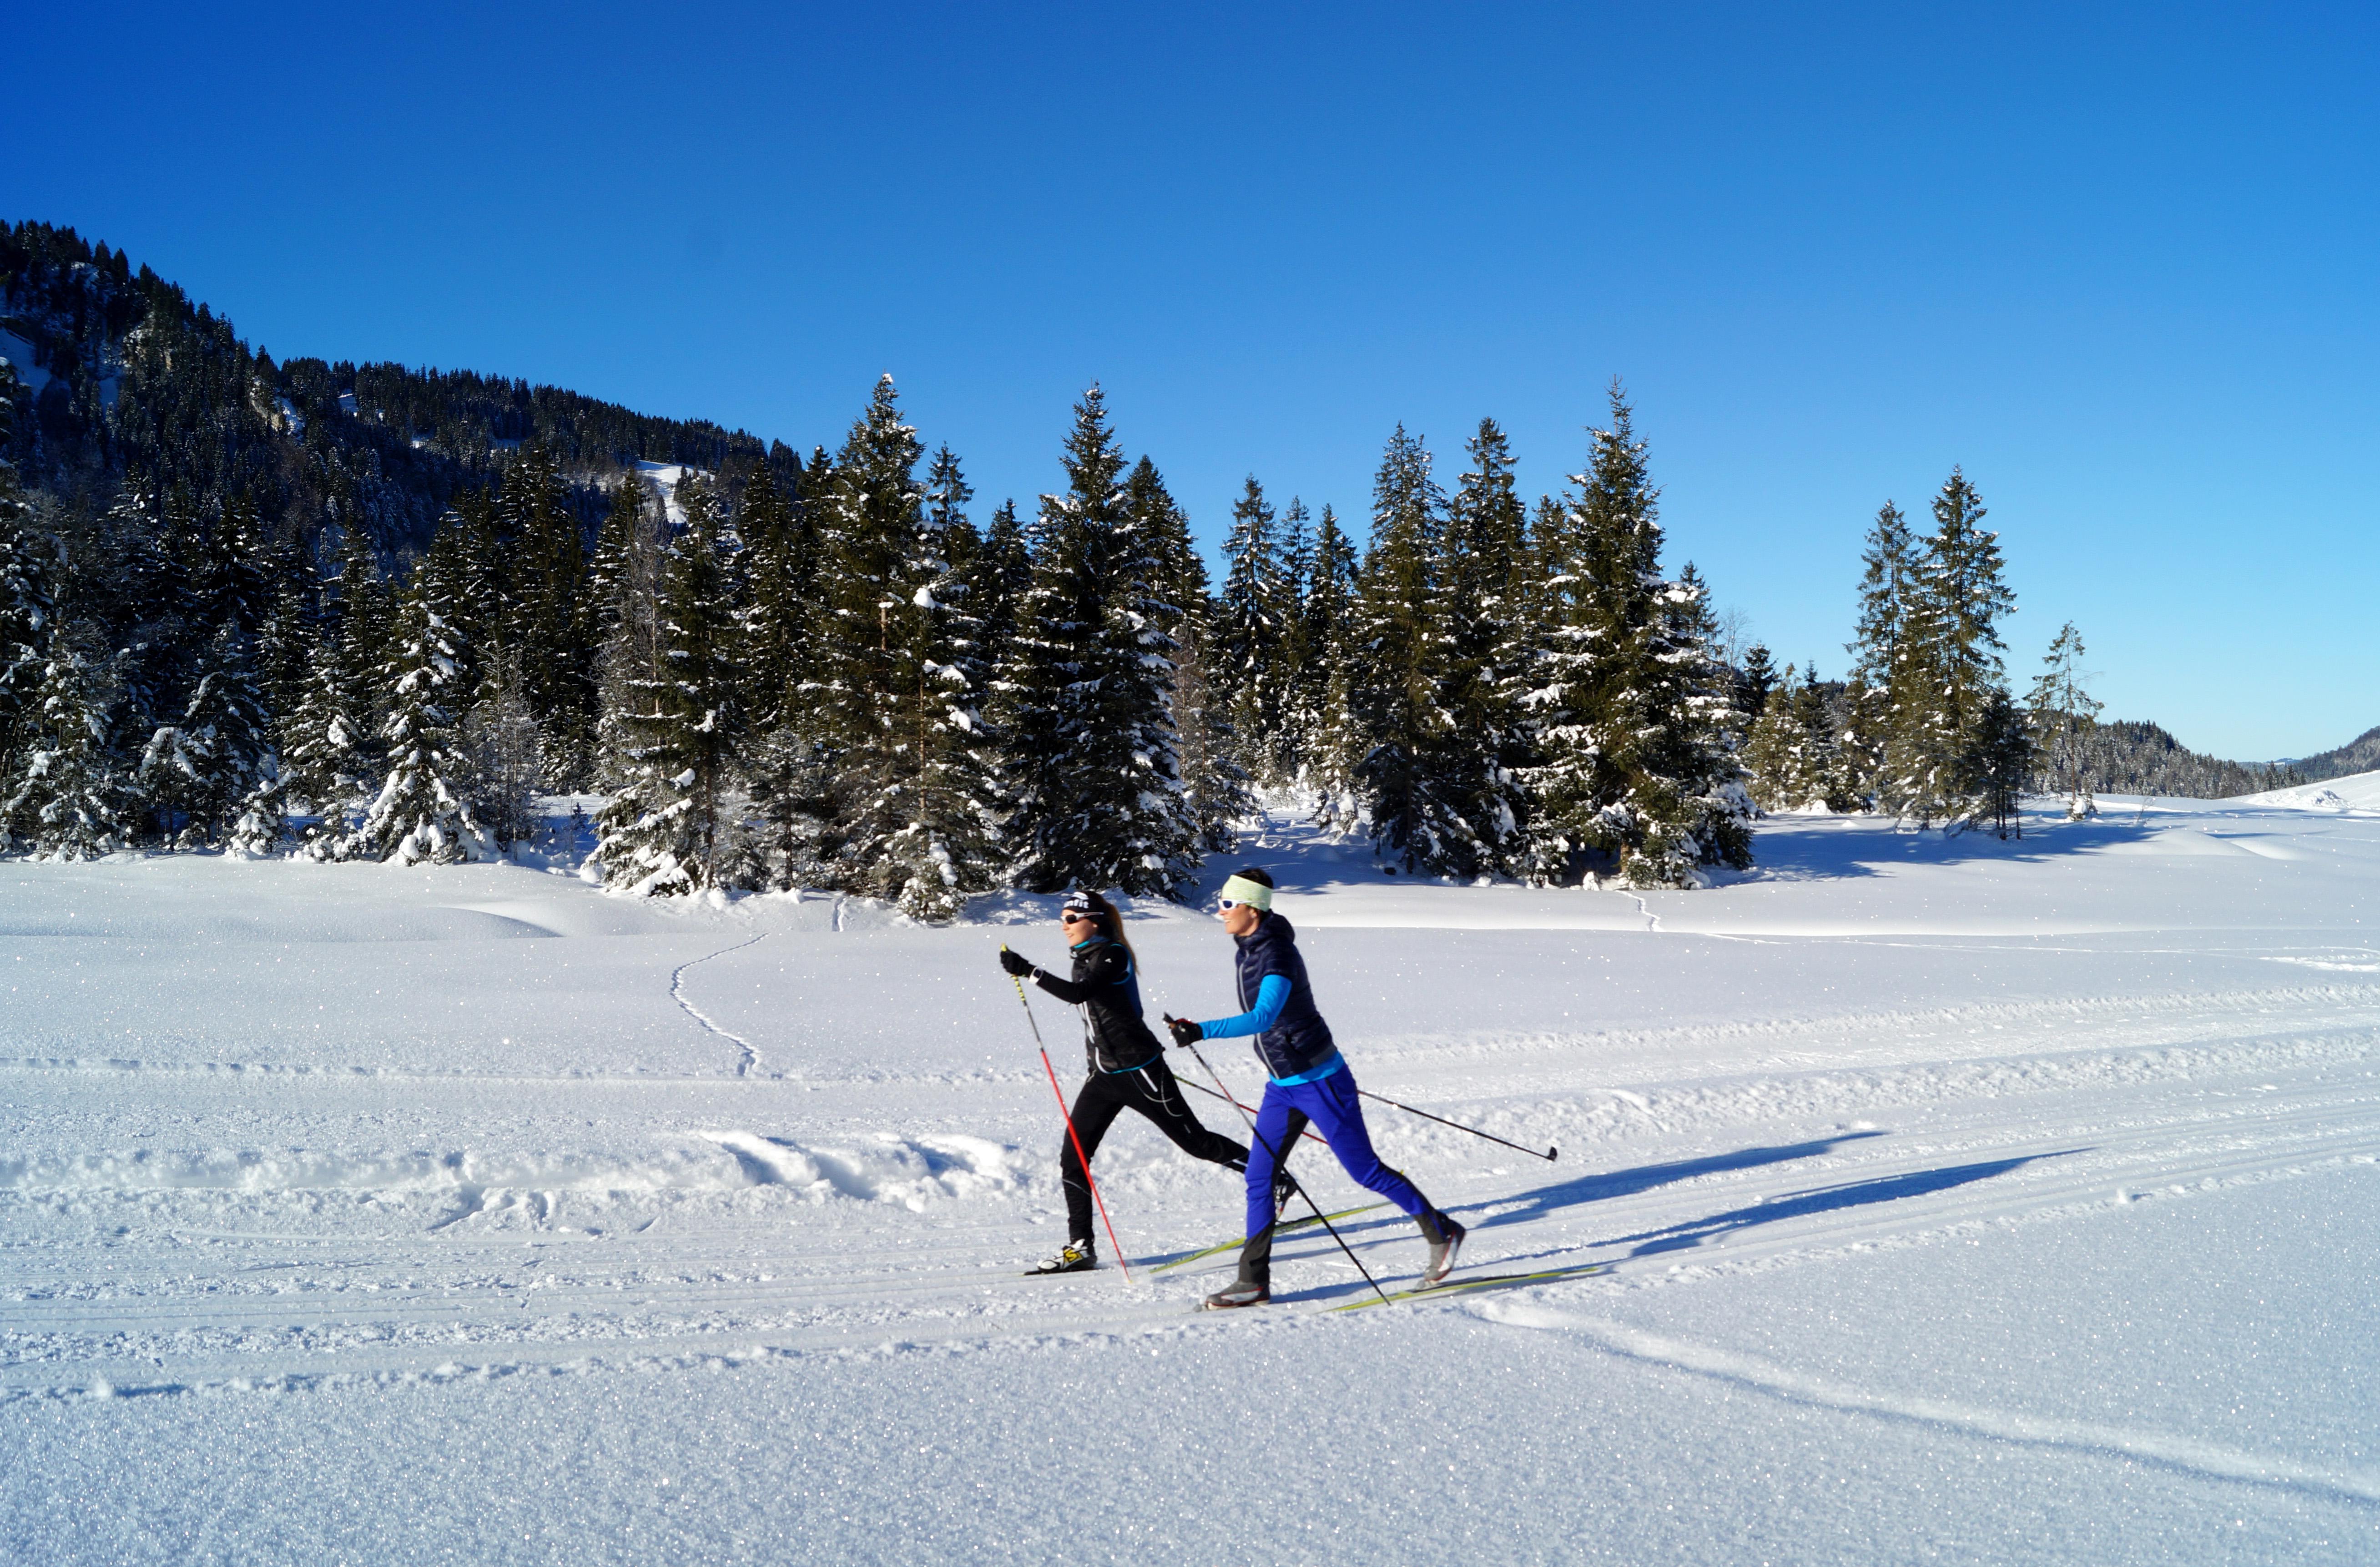 Langlaufen in Sibratsgfäll